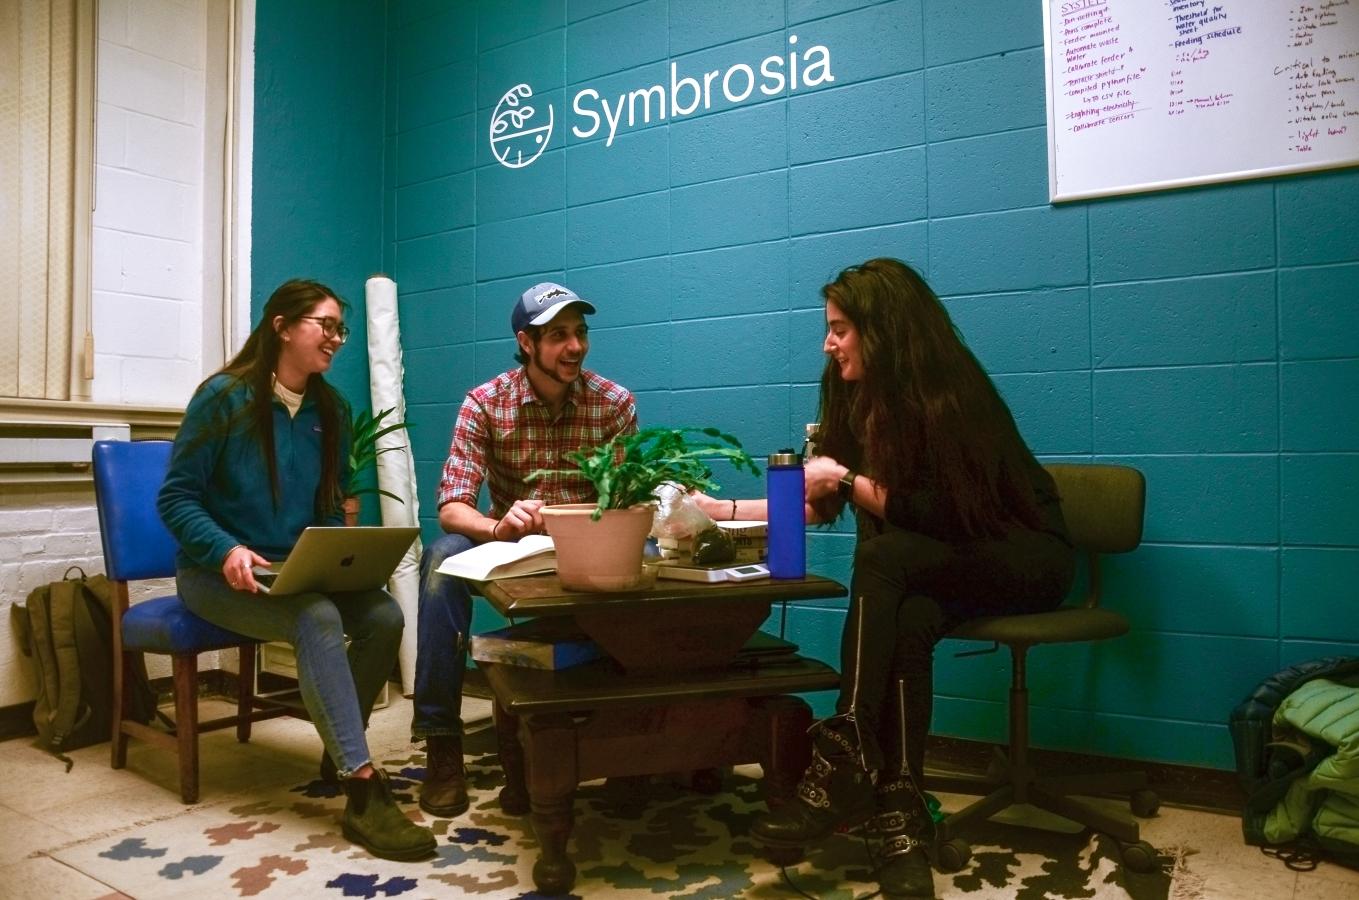 Symbrosia team candid